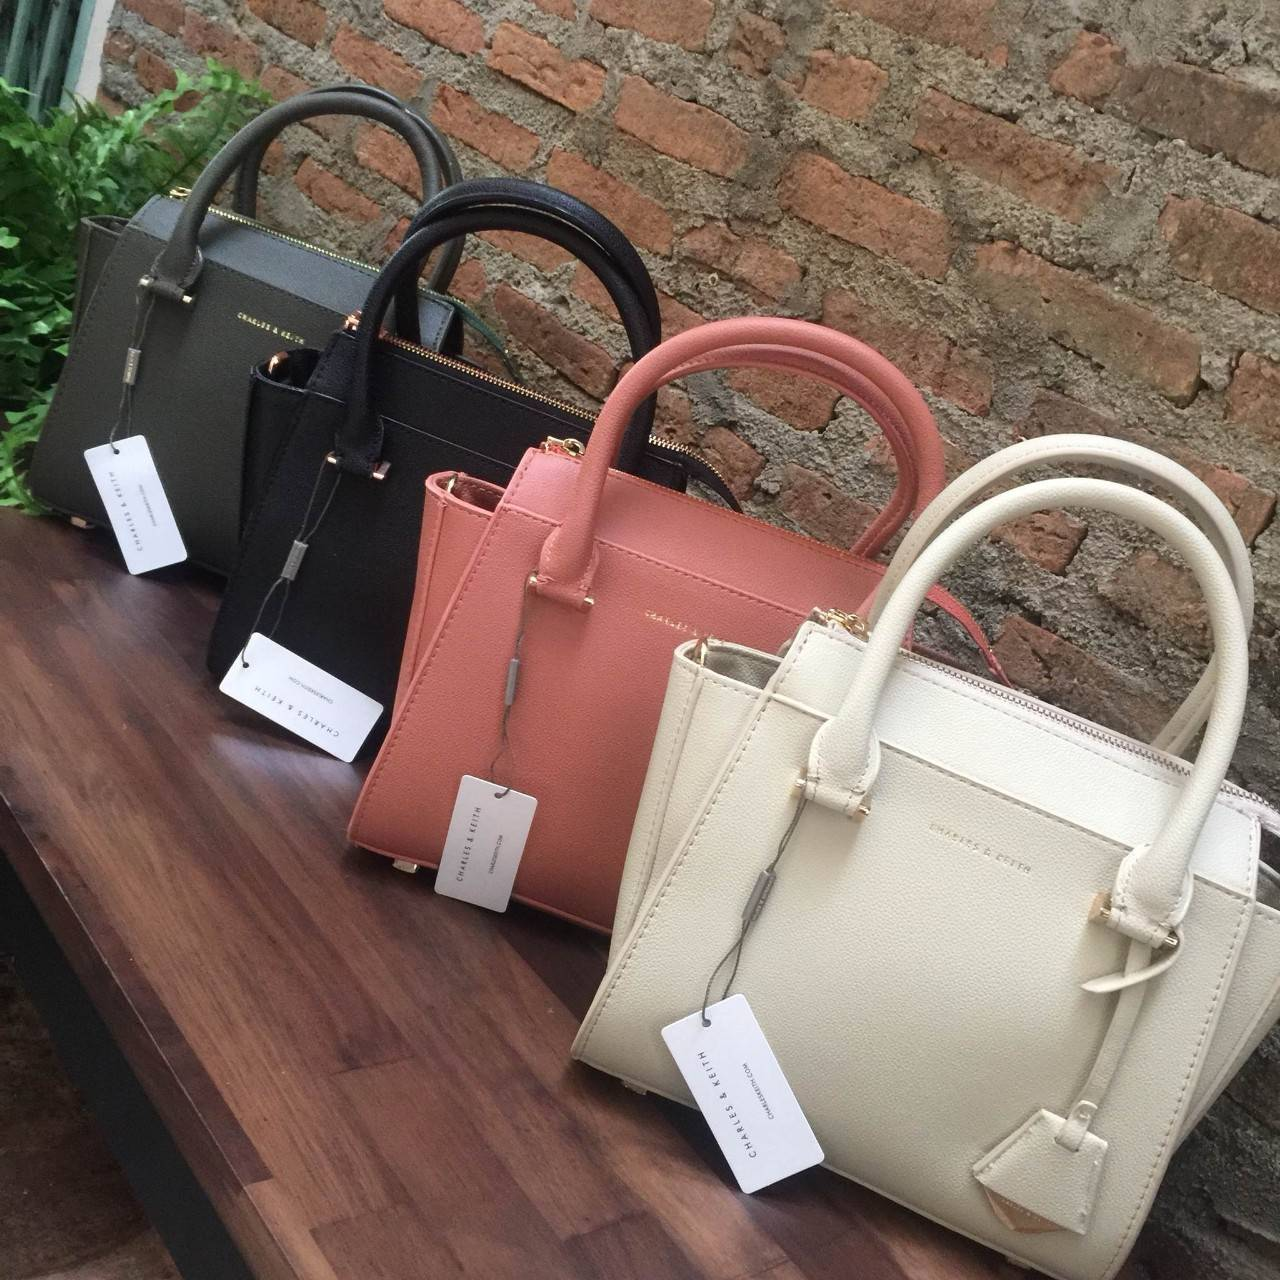 CHARLES & KEITH Mini CITY BAG มี 4 สีให้เลือกค่ะ * สินค้า outlet